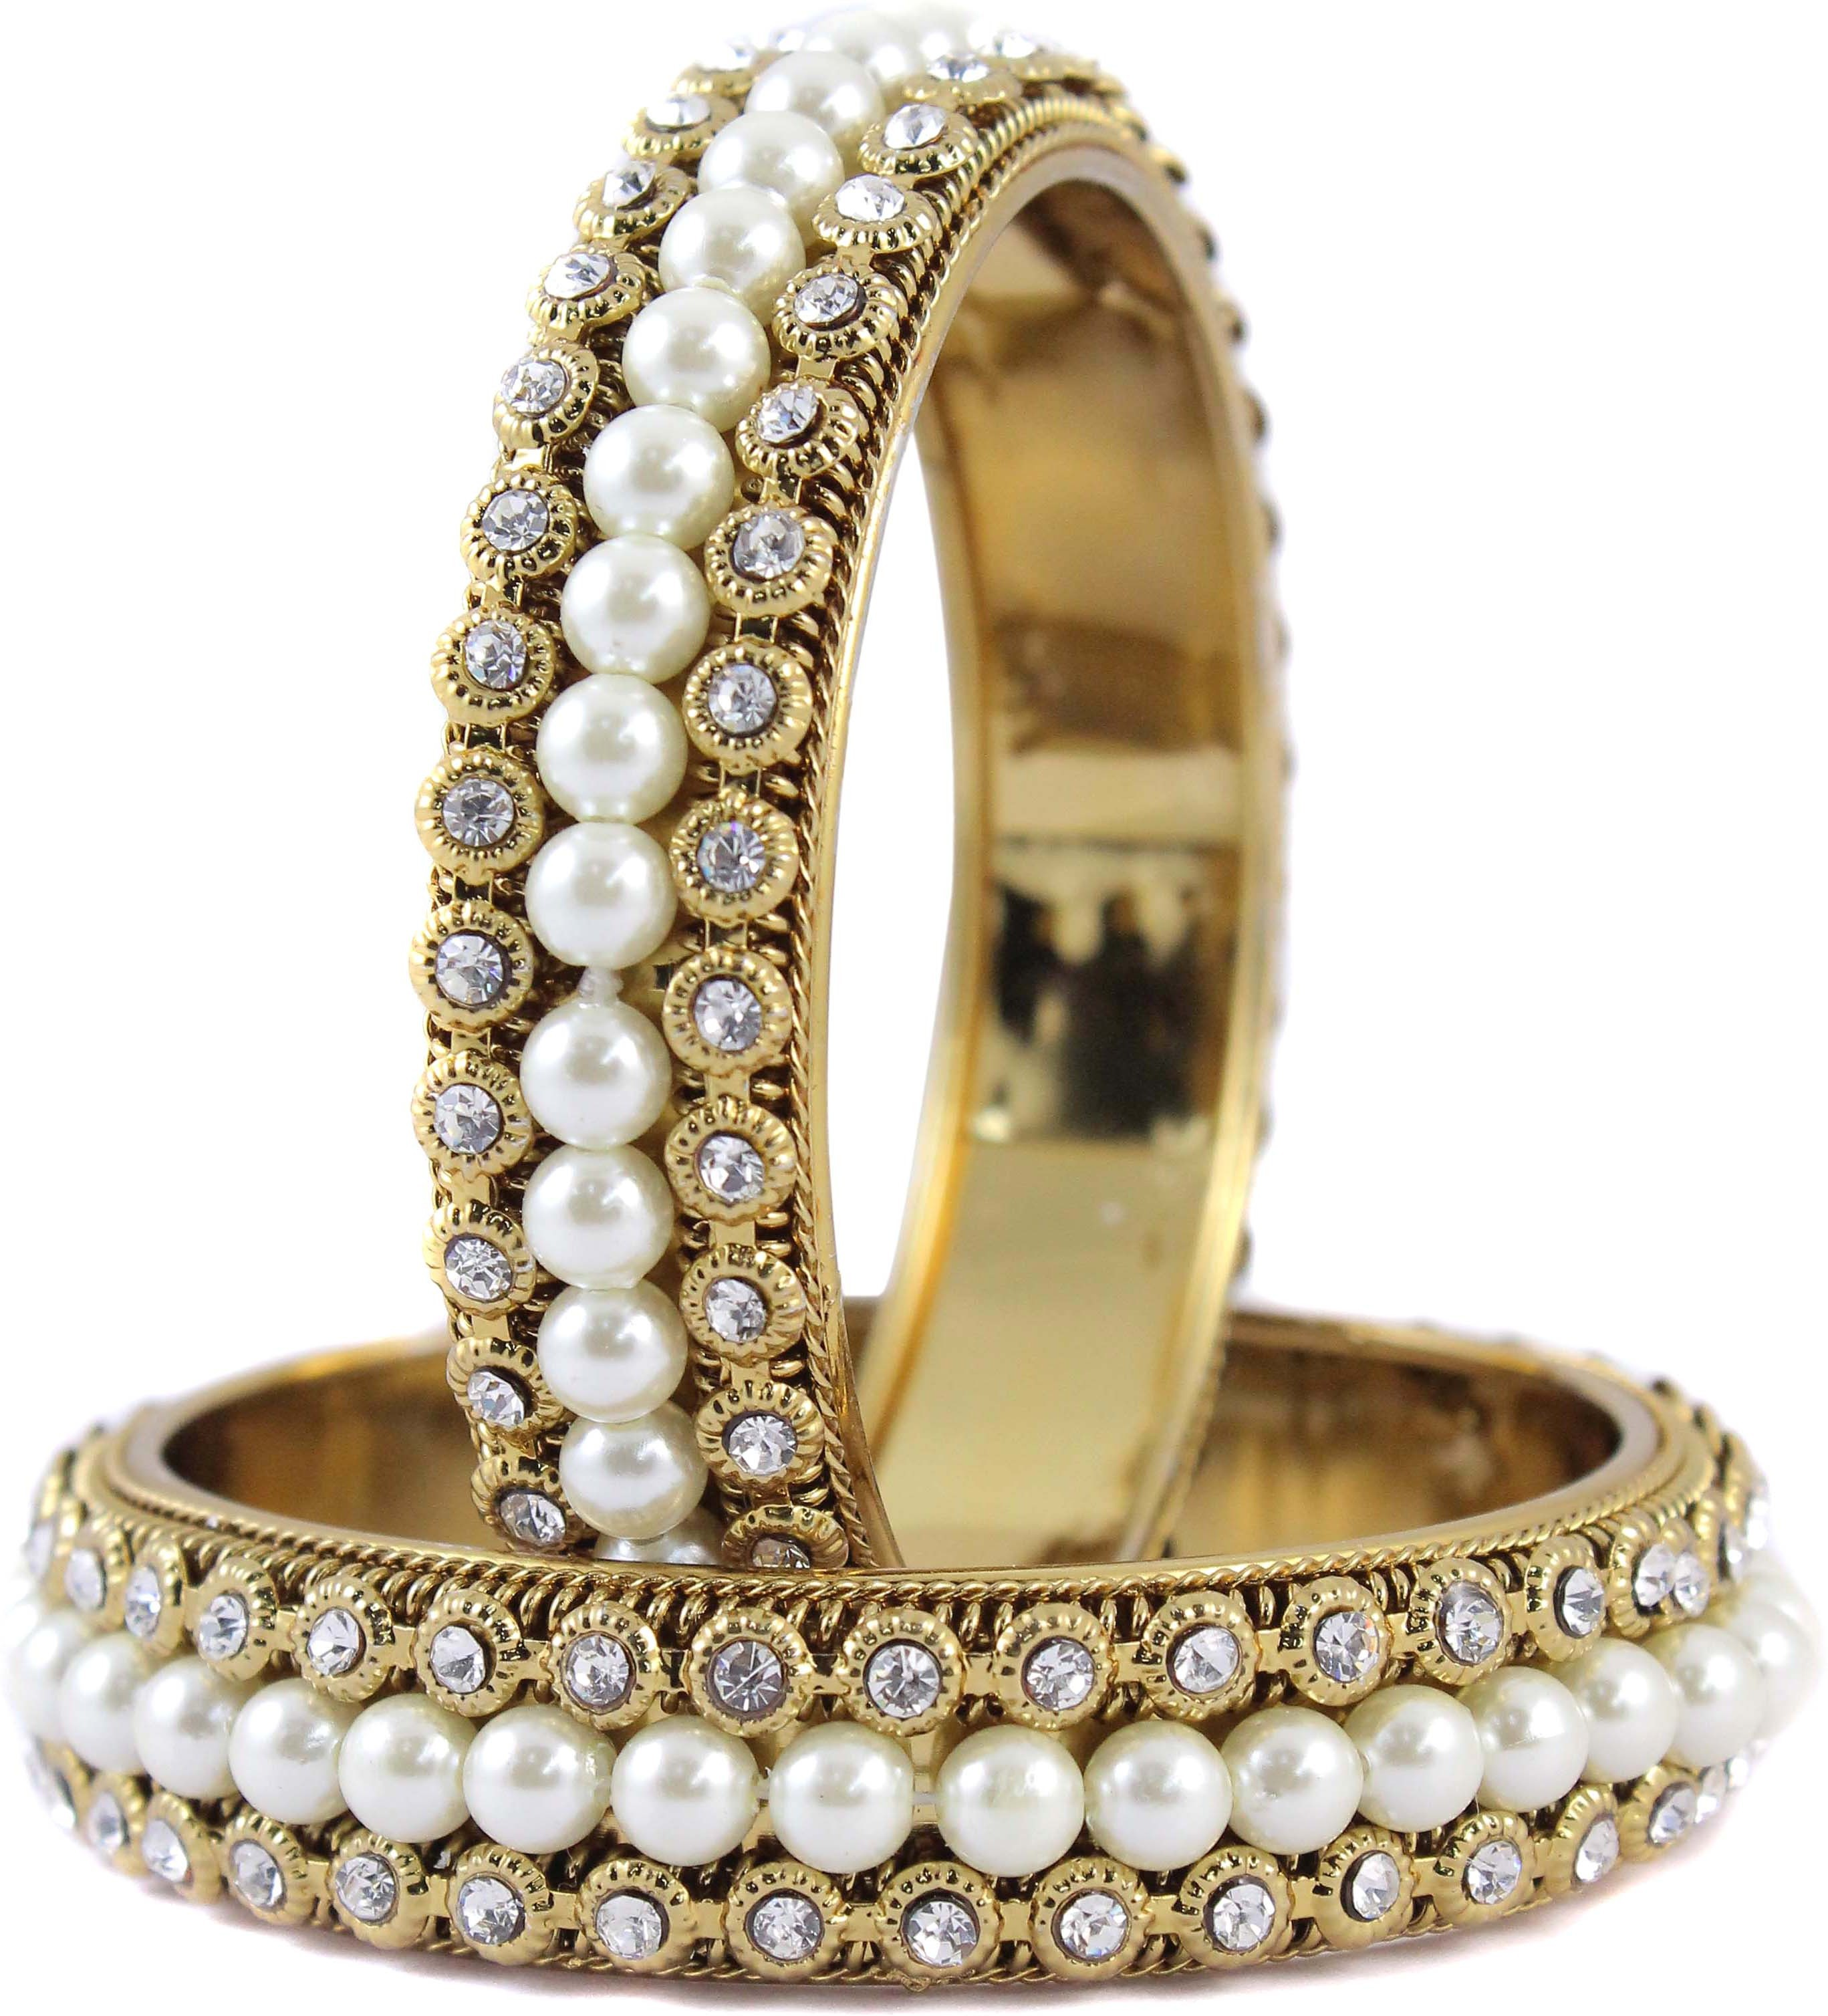 Deals - Delhi - Minimum 50% Off <br> Earrings, Necklaces, Bracelets...<br> Category - jewellery<br> Business - Flipkart.com